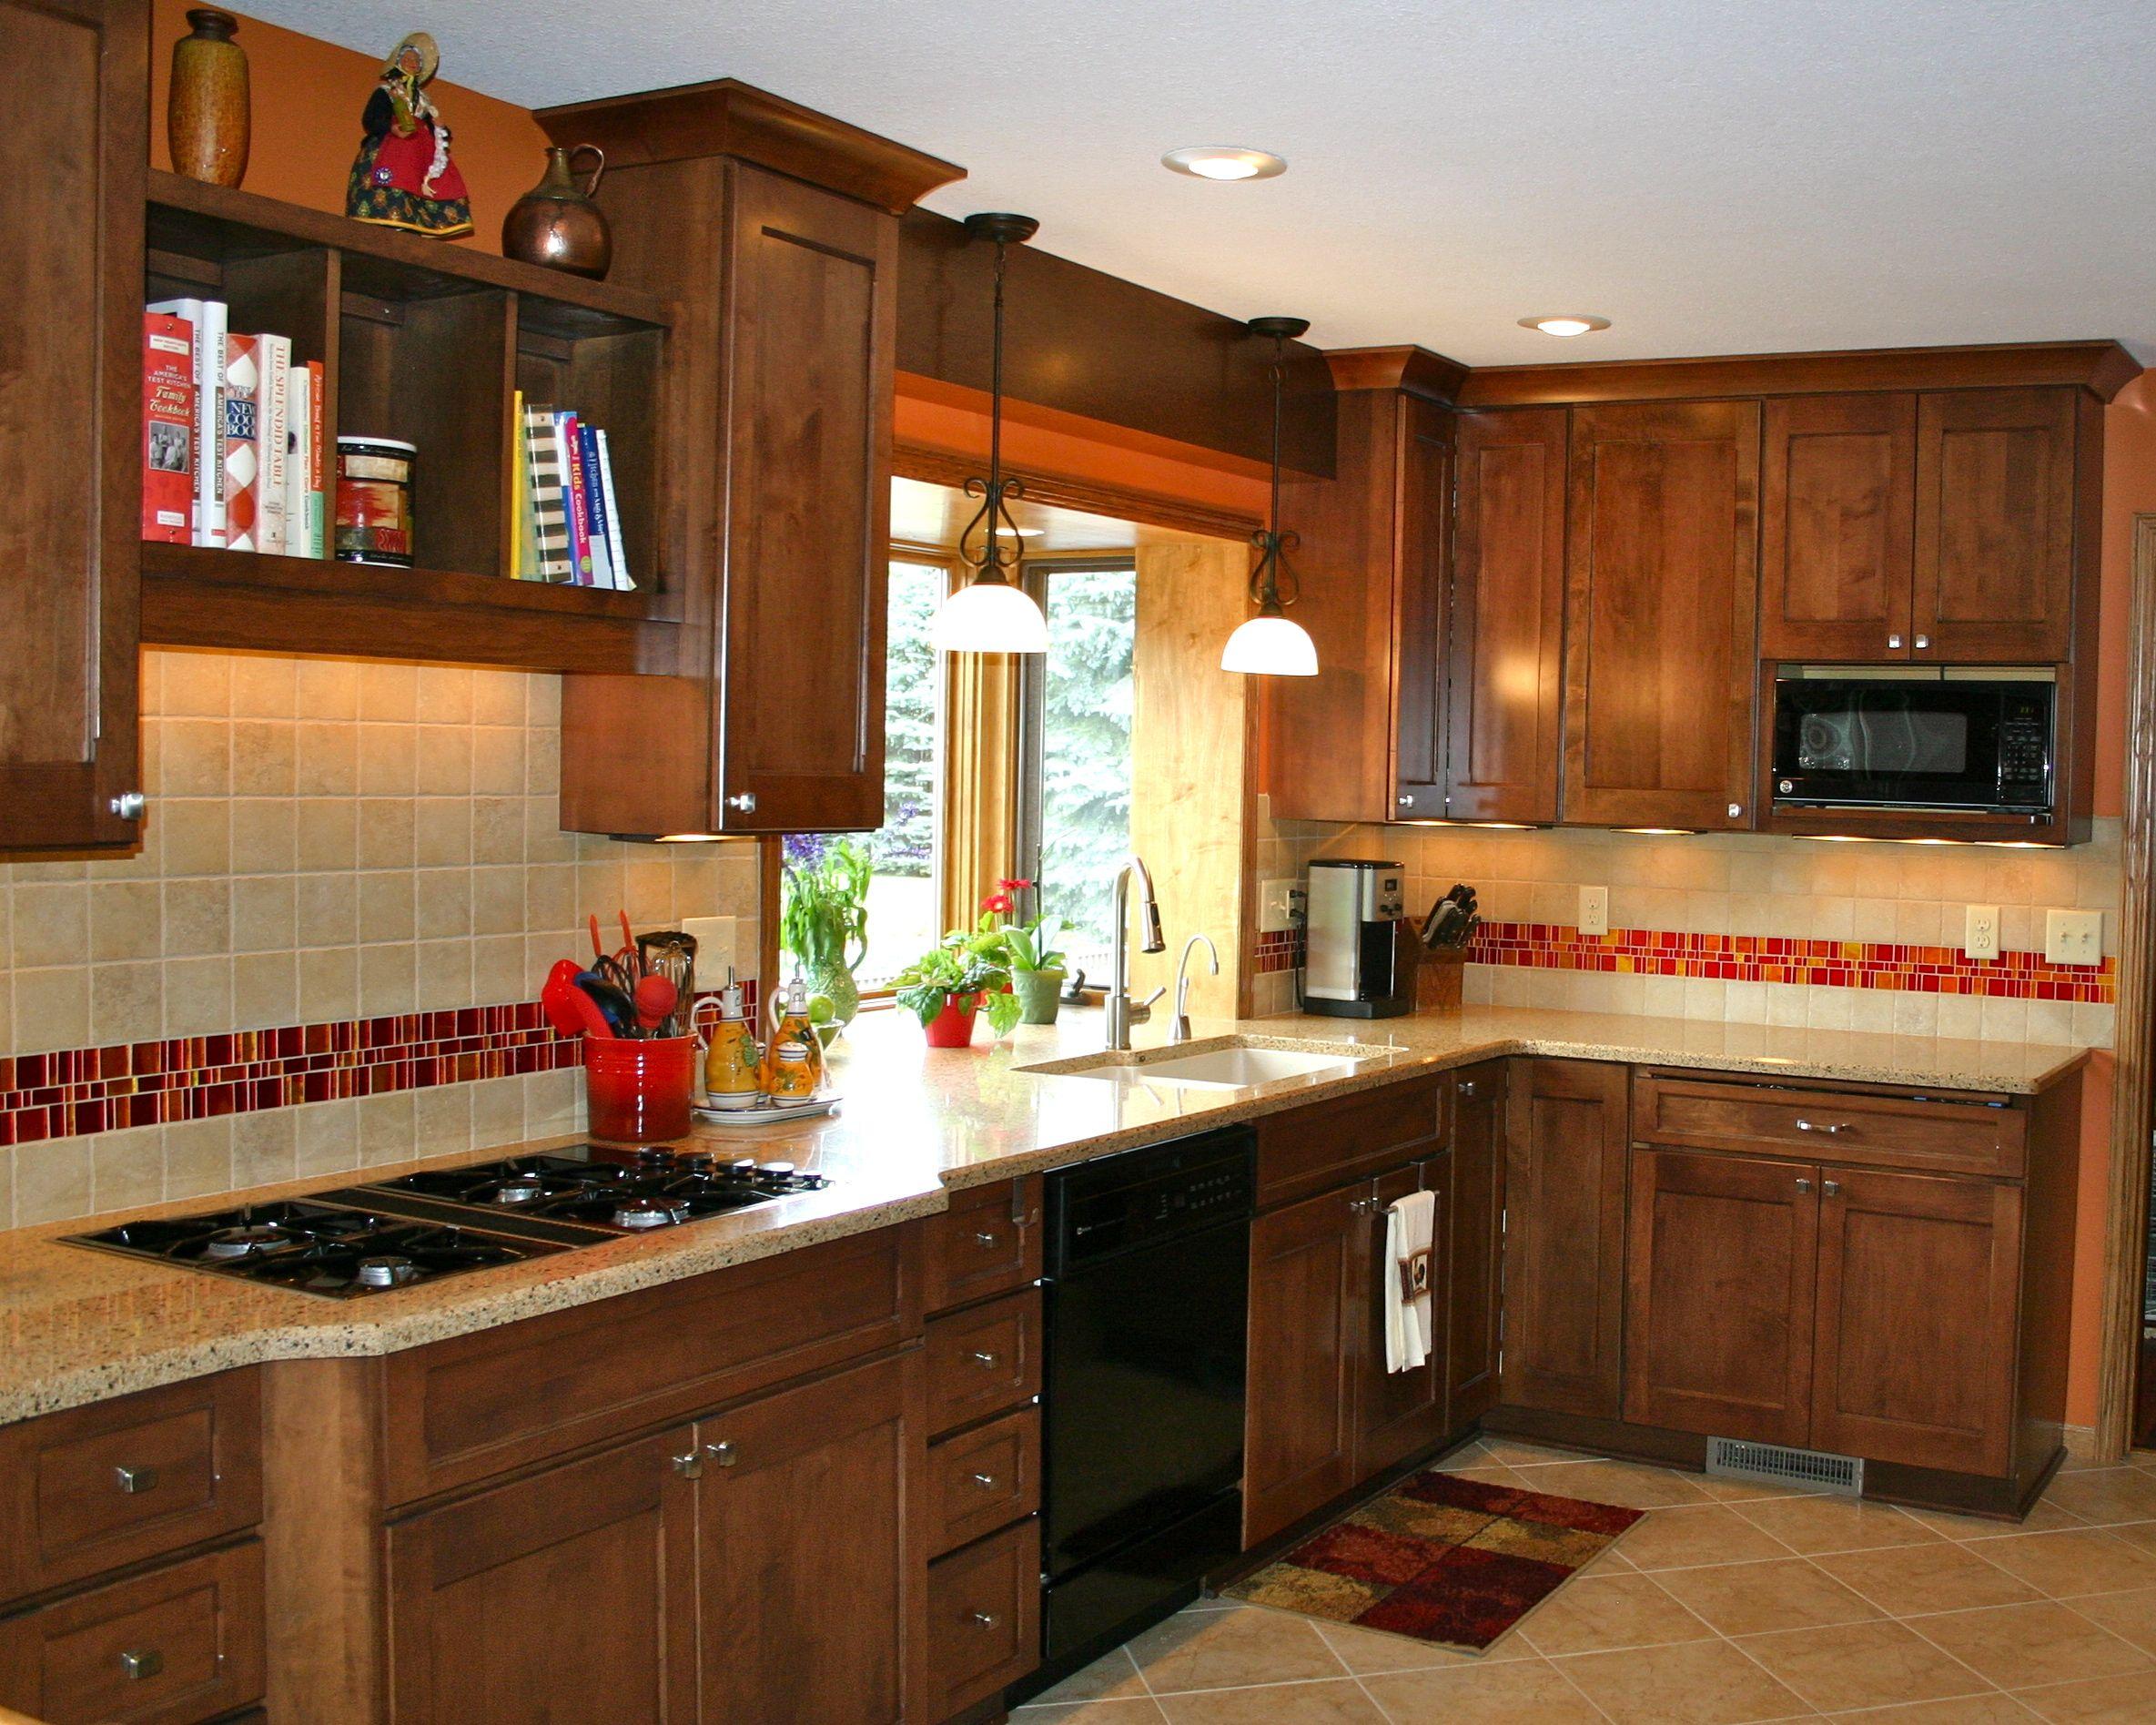 Love the red tile backsplash accent  Kitchens  Kitchen